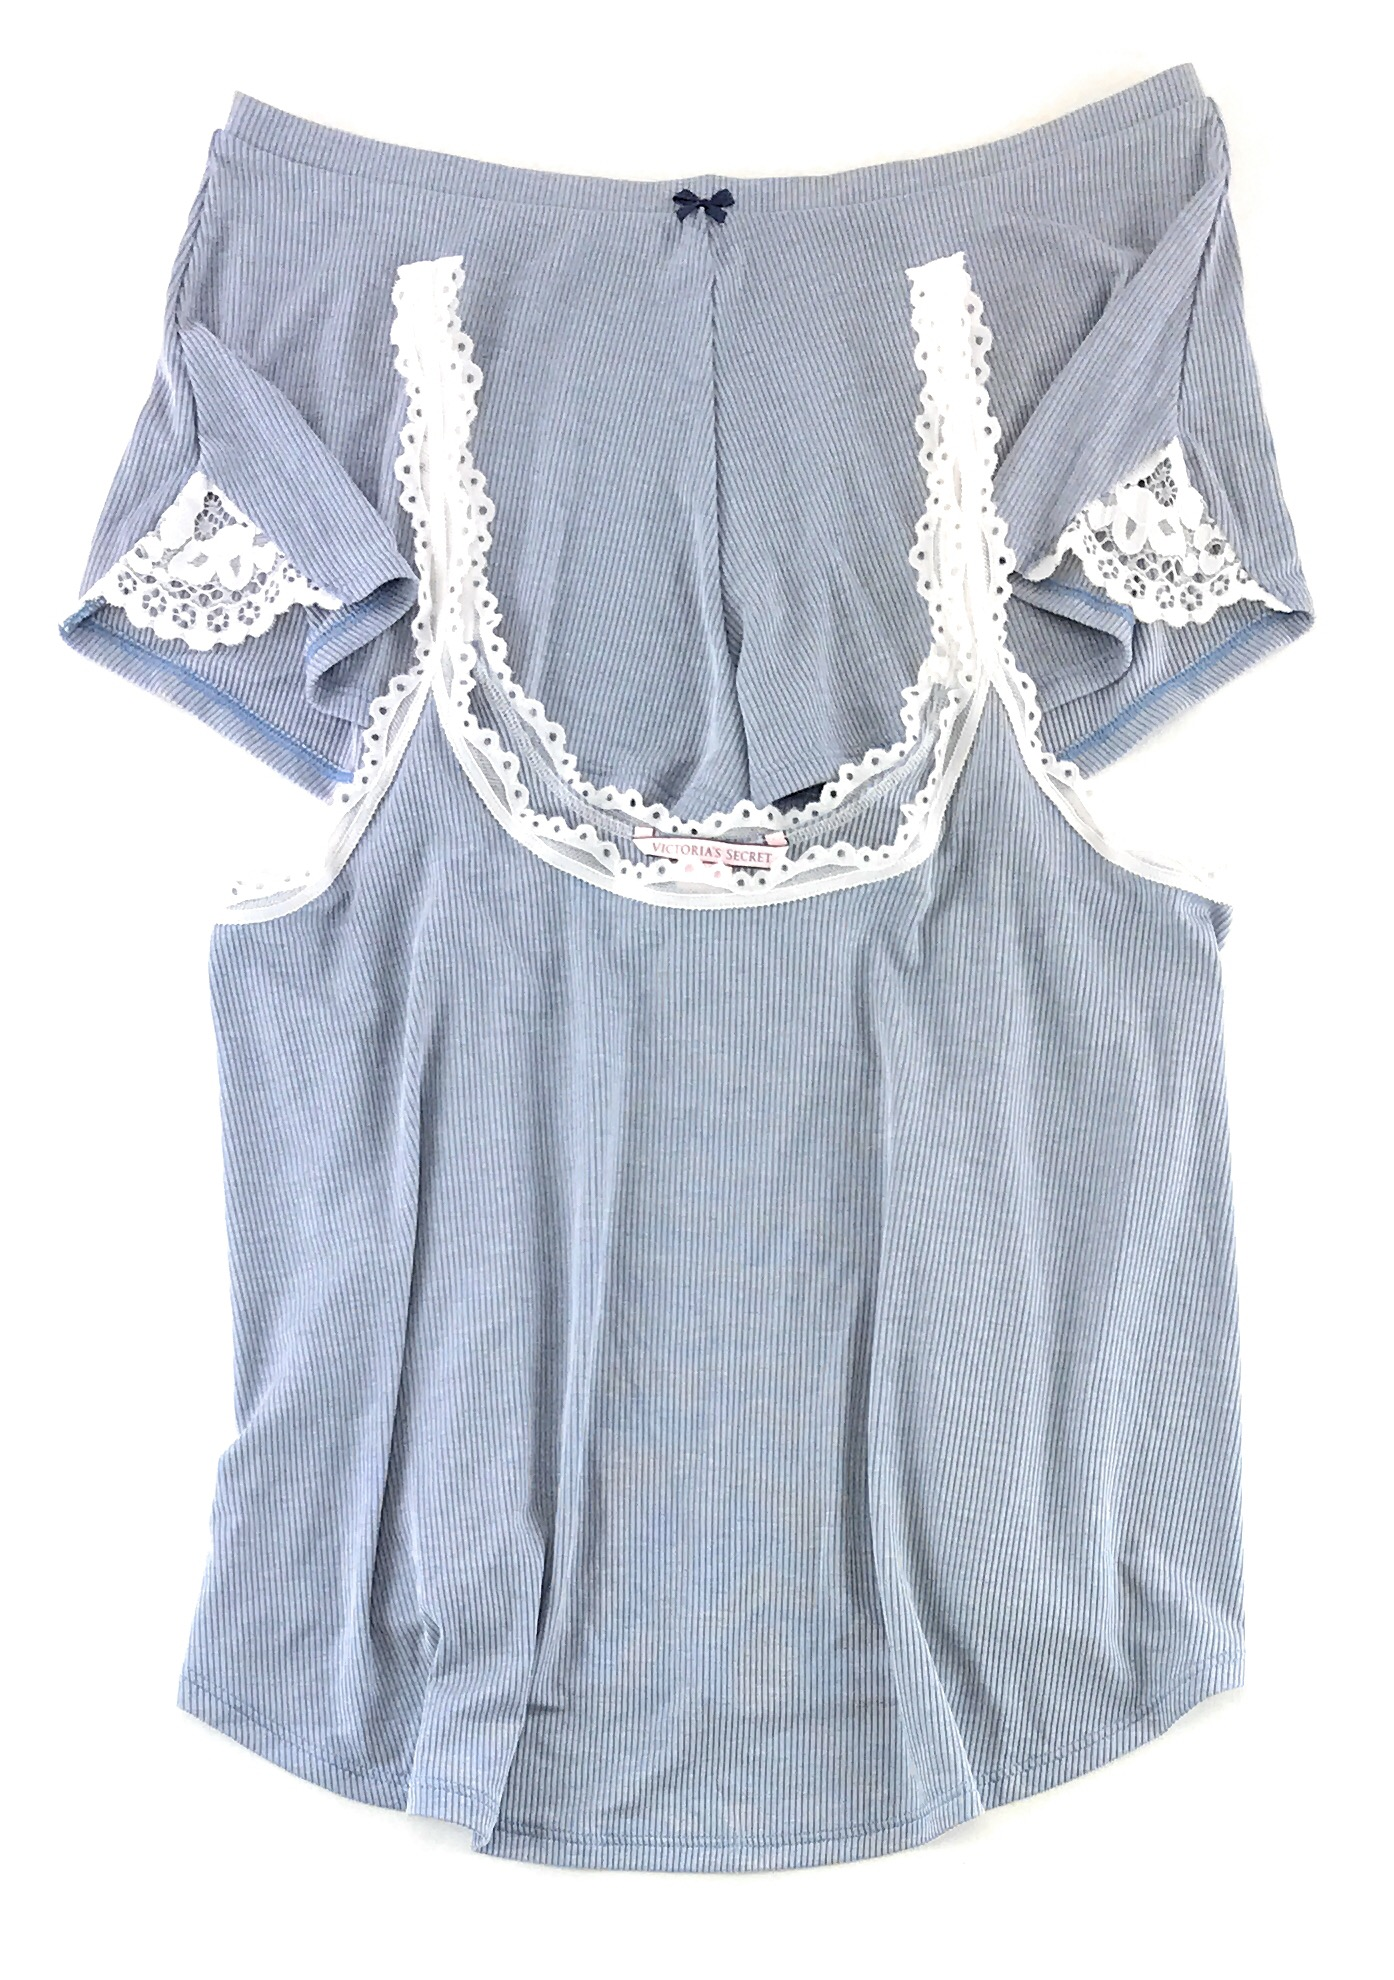 Victoria-039-s-Secret-Pajamas-Set-PJs-2-Piece-Ribbed-Sleep-Cami-Tank-and-Shorts thumbnail 6